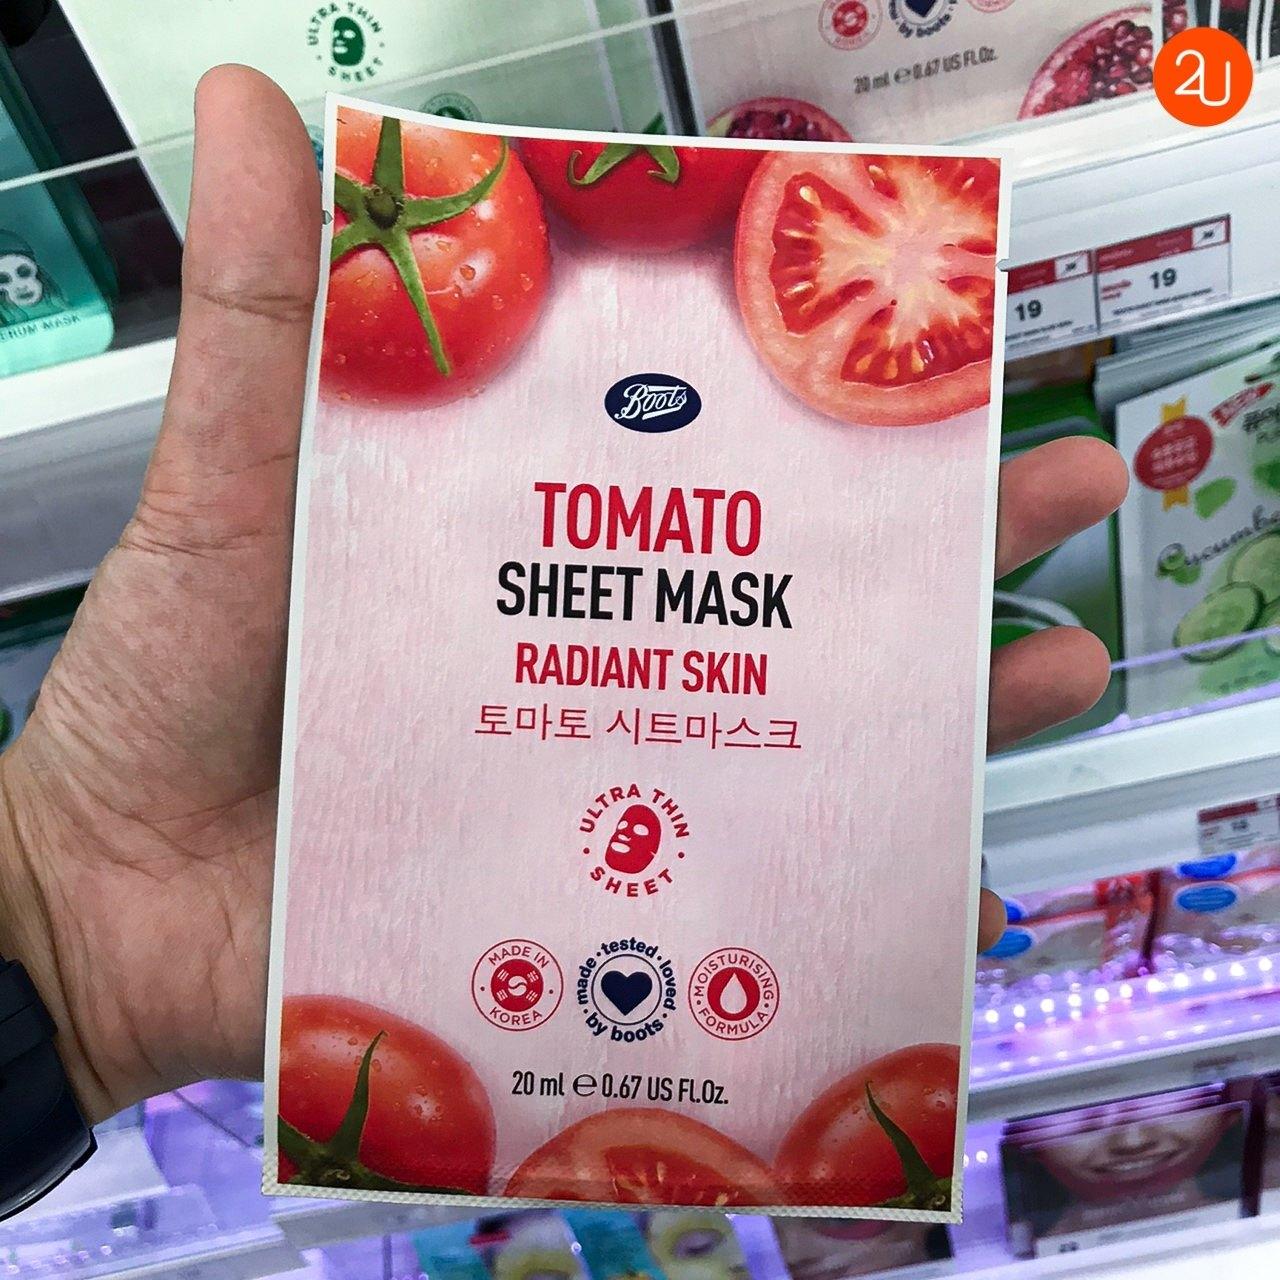 Tomato Sheet Mask